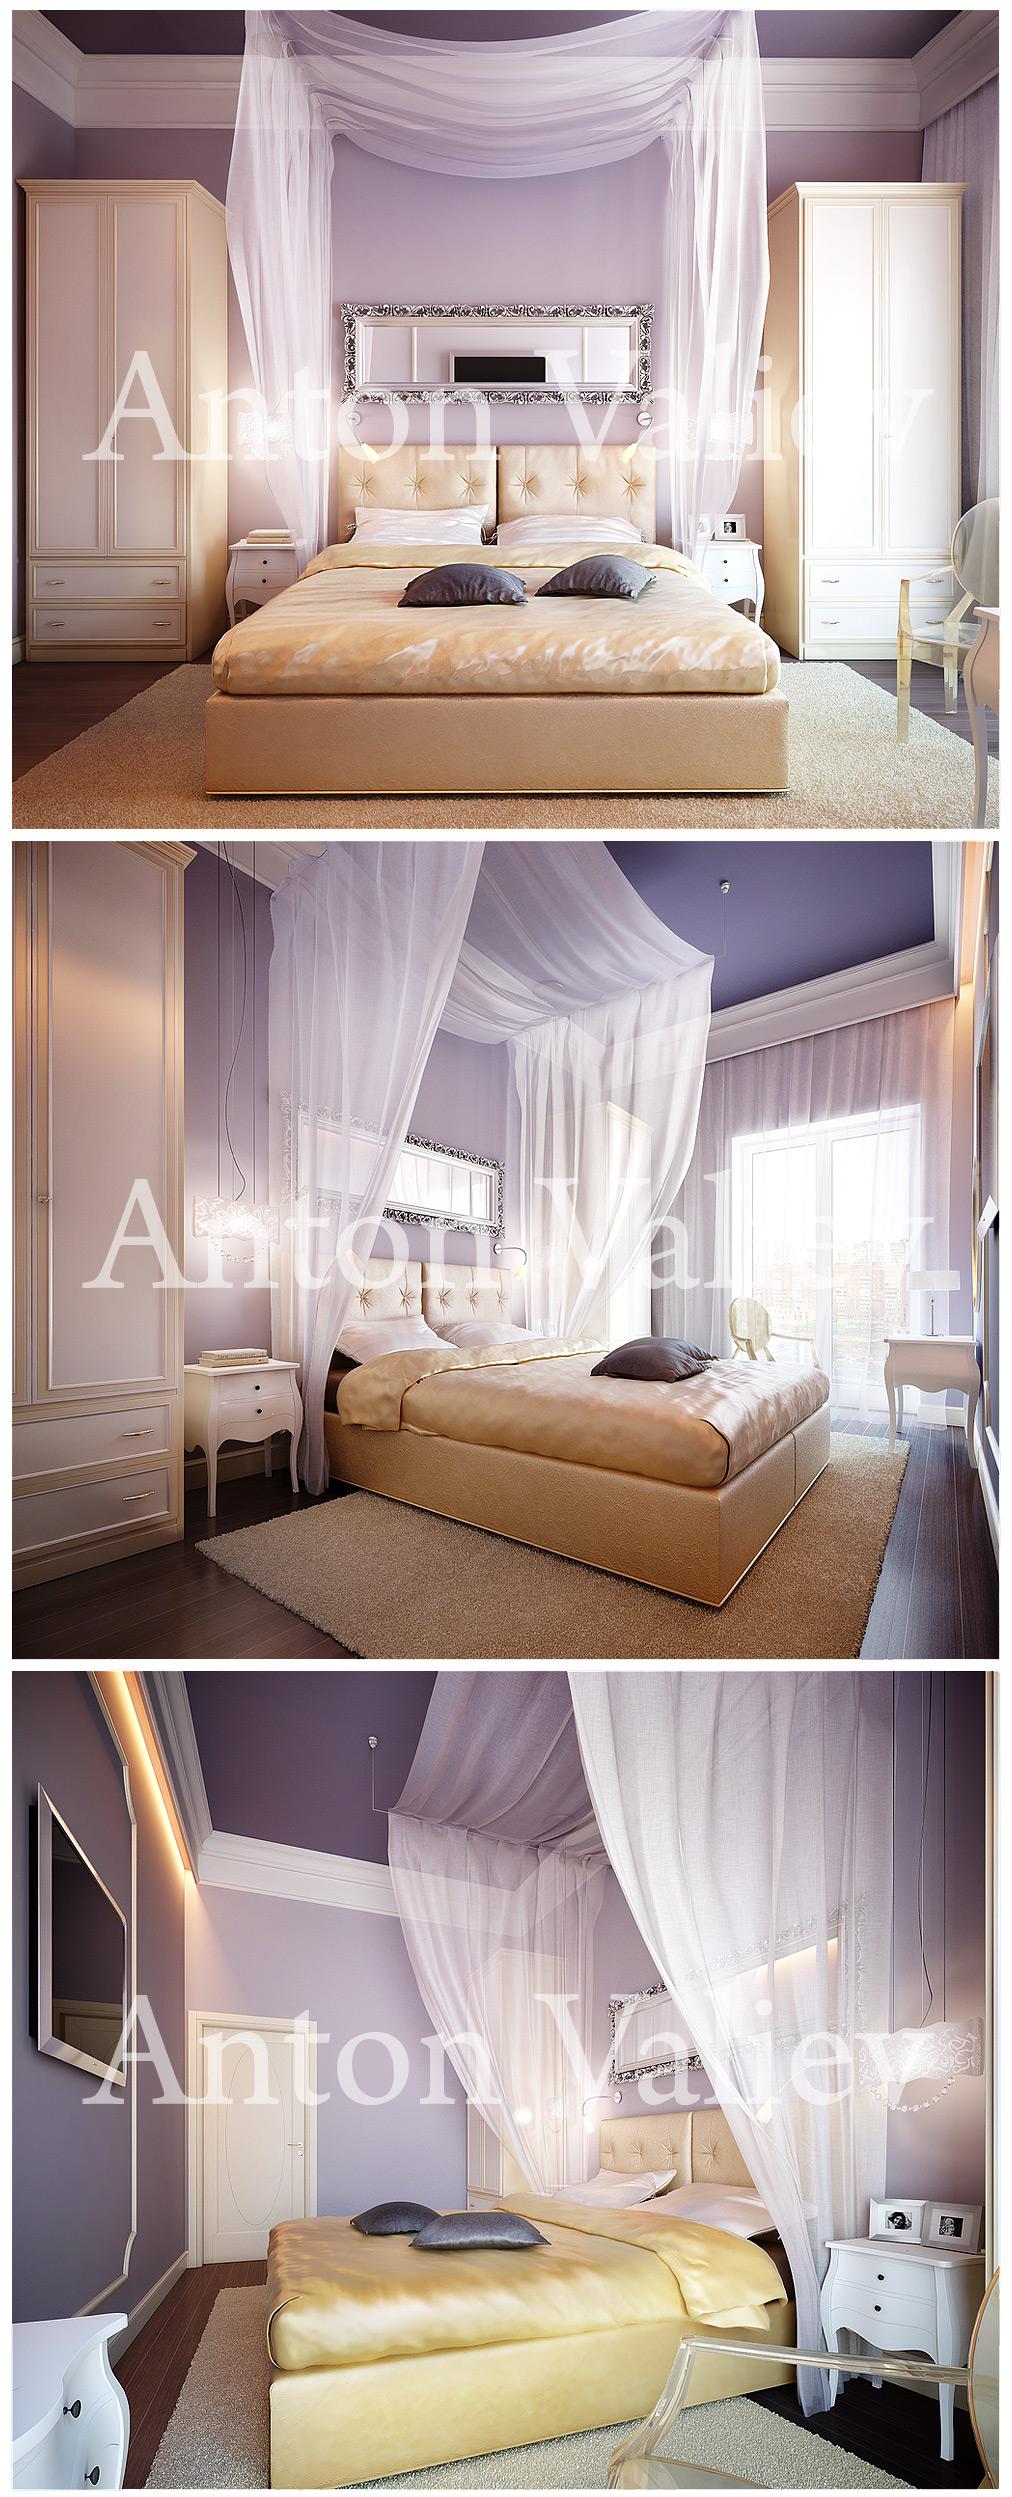 Апартаменты. г.С. Петербург. Спальня